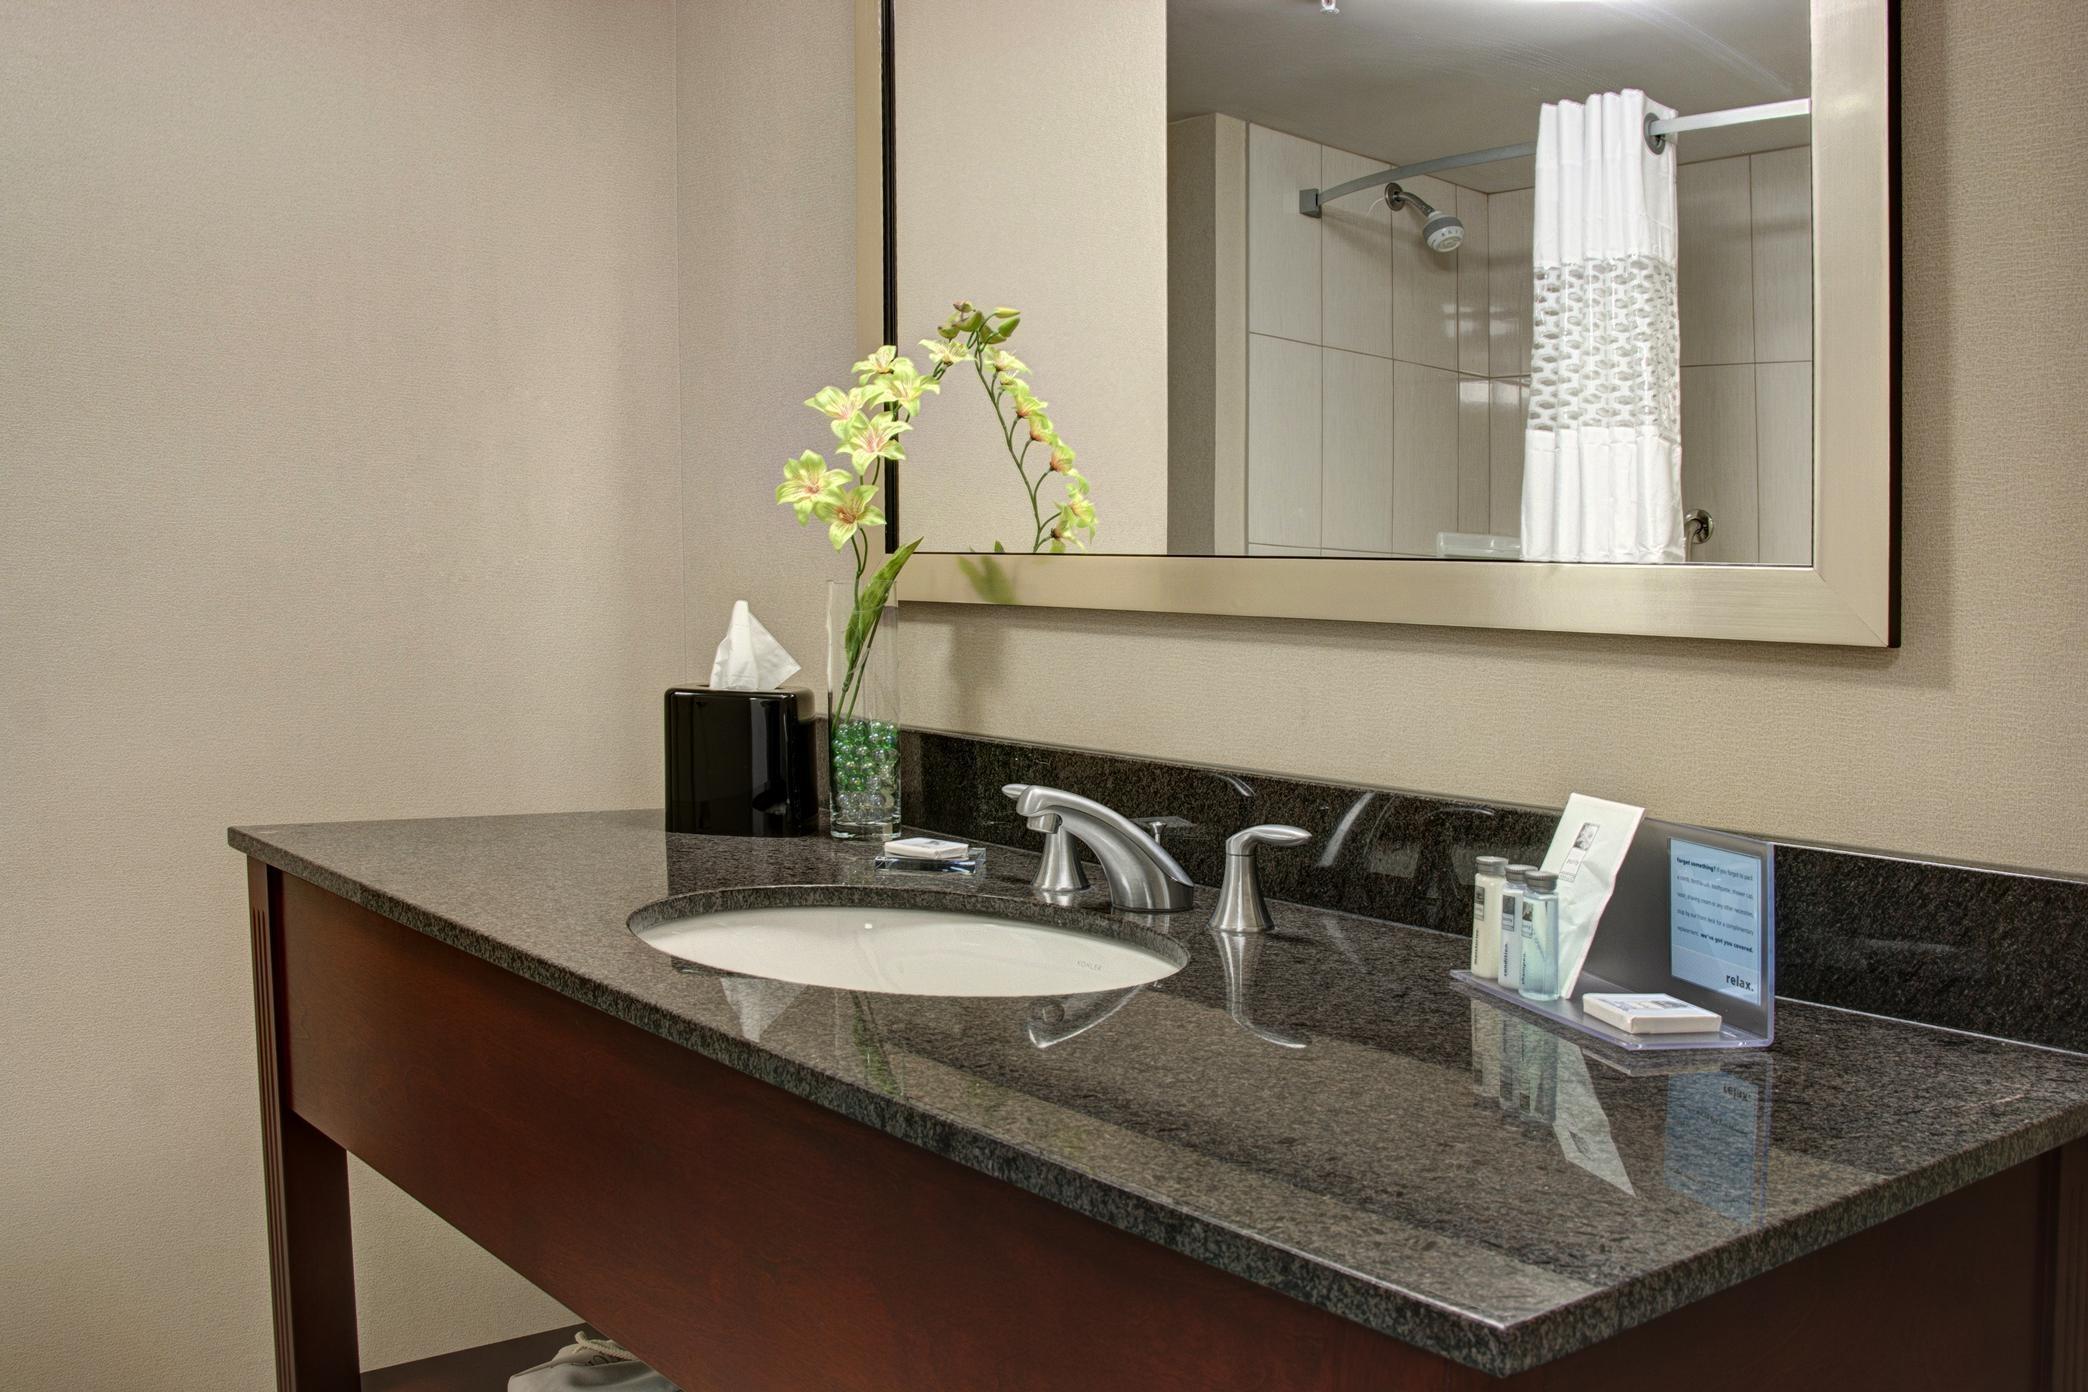 Hampton Inn by Hilton Brampton Toronto in Brampton: Standard Bathroom Vanity